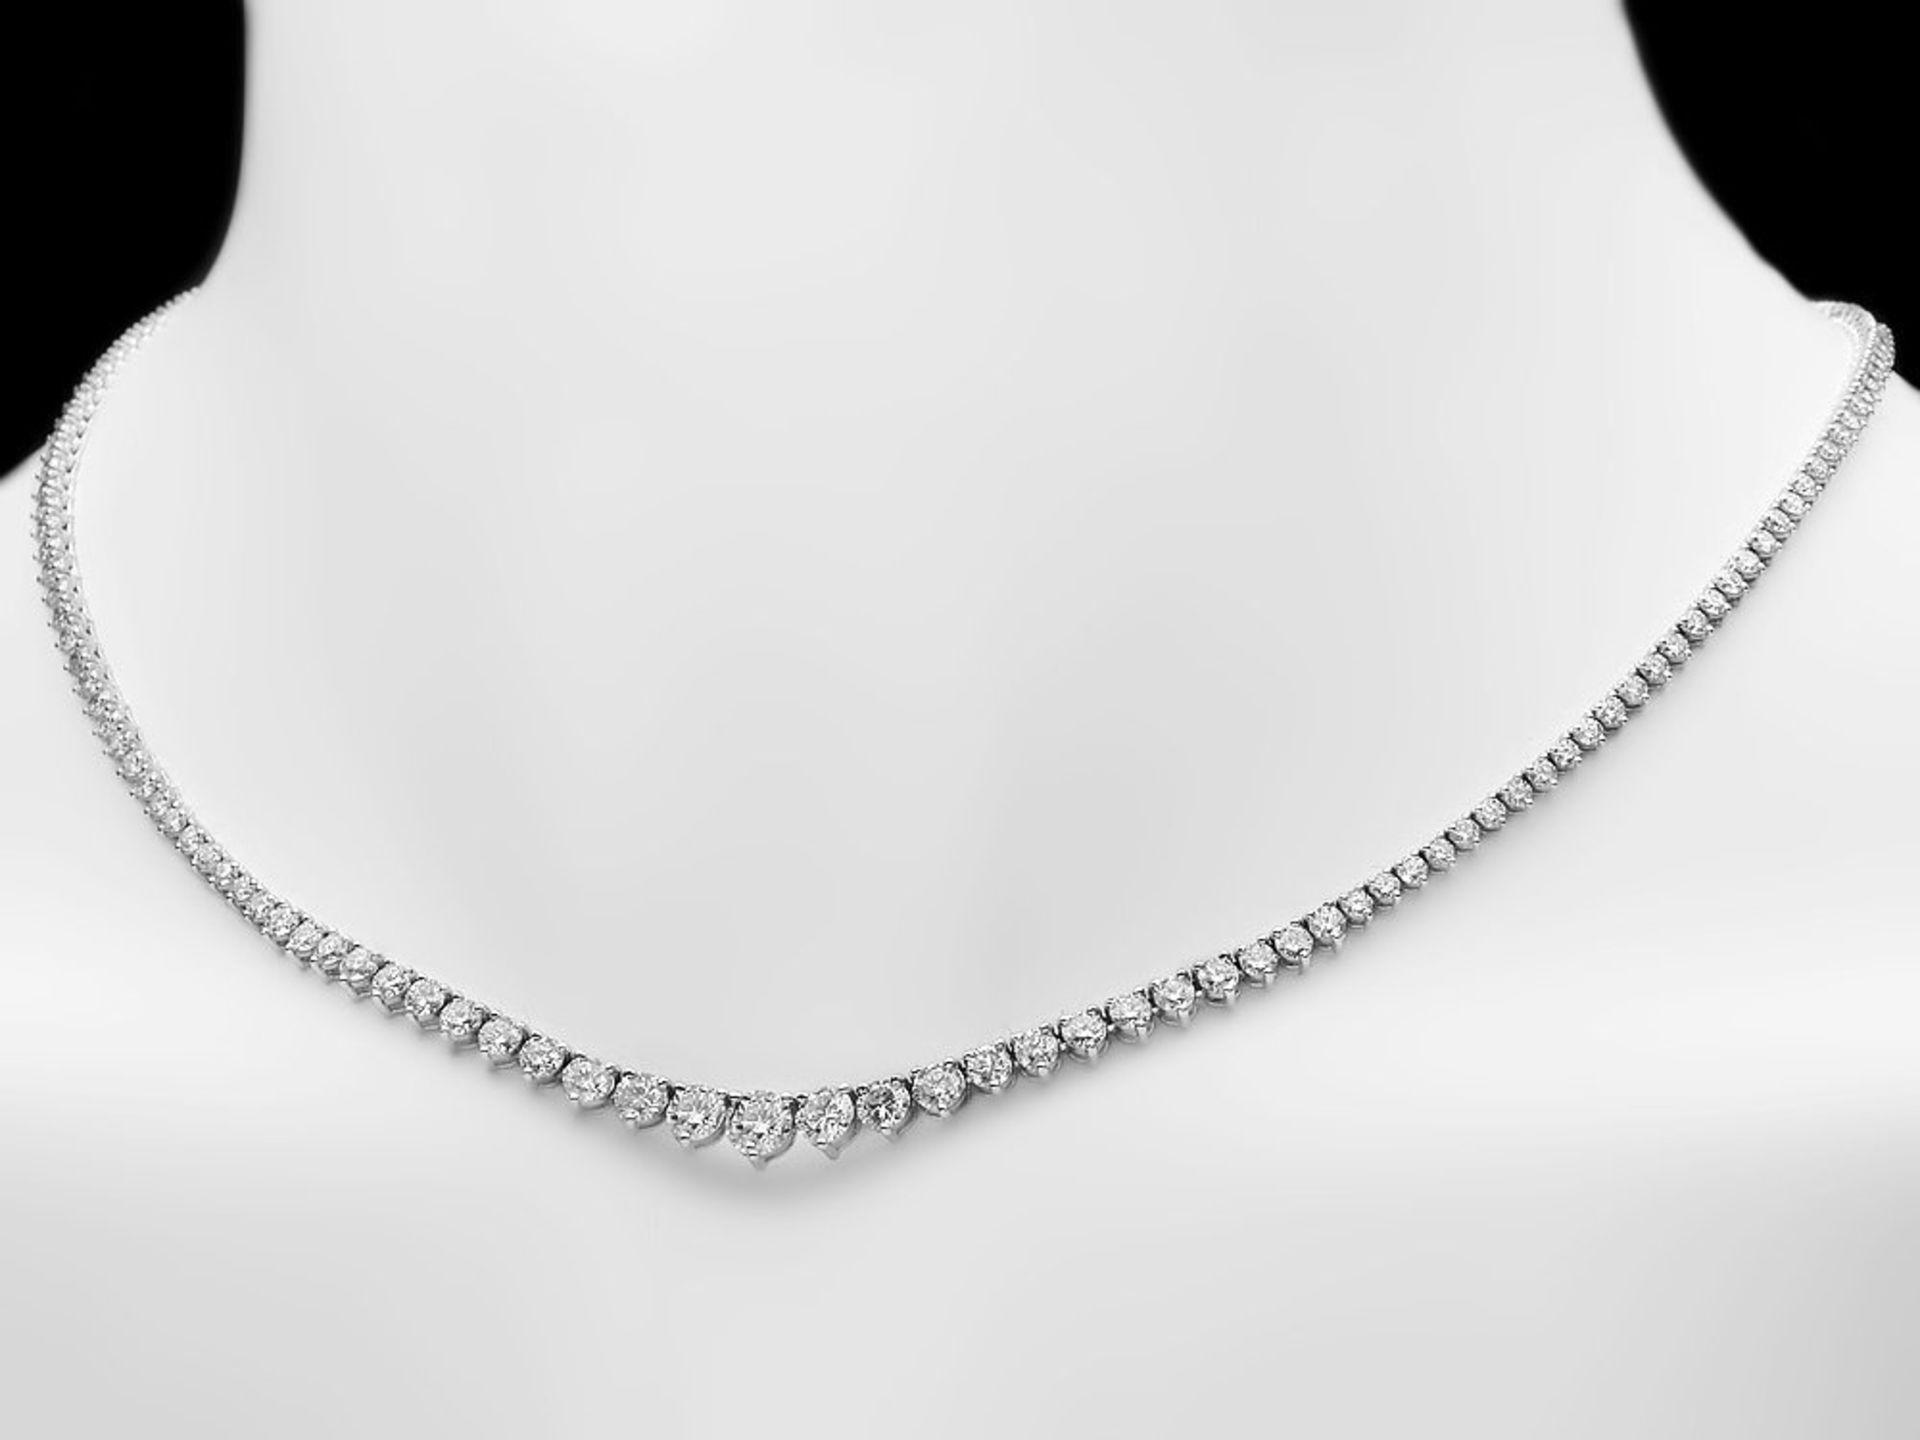 18k White Gold 12.00ct Diamond Necklace - Image 3 of 5